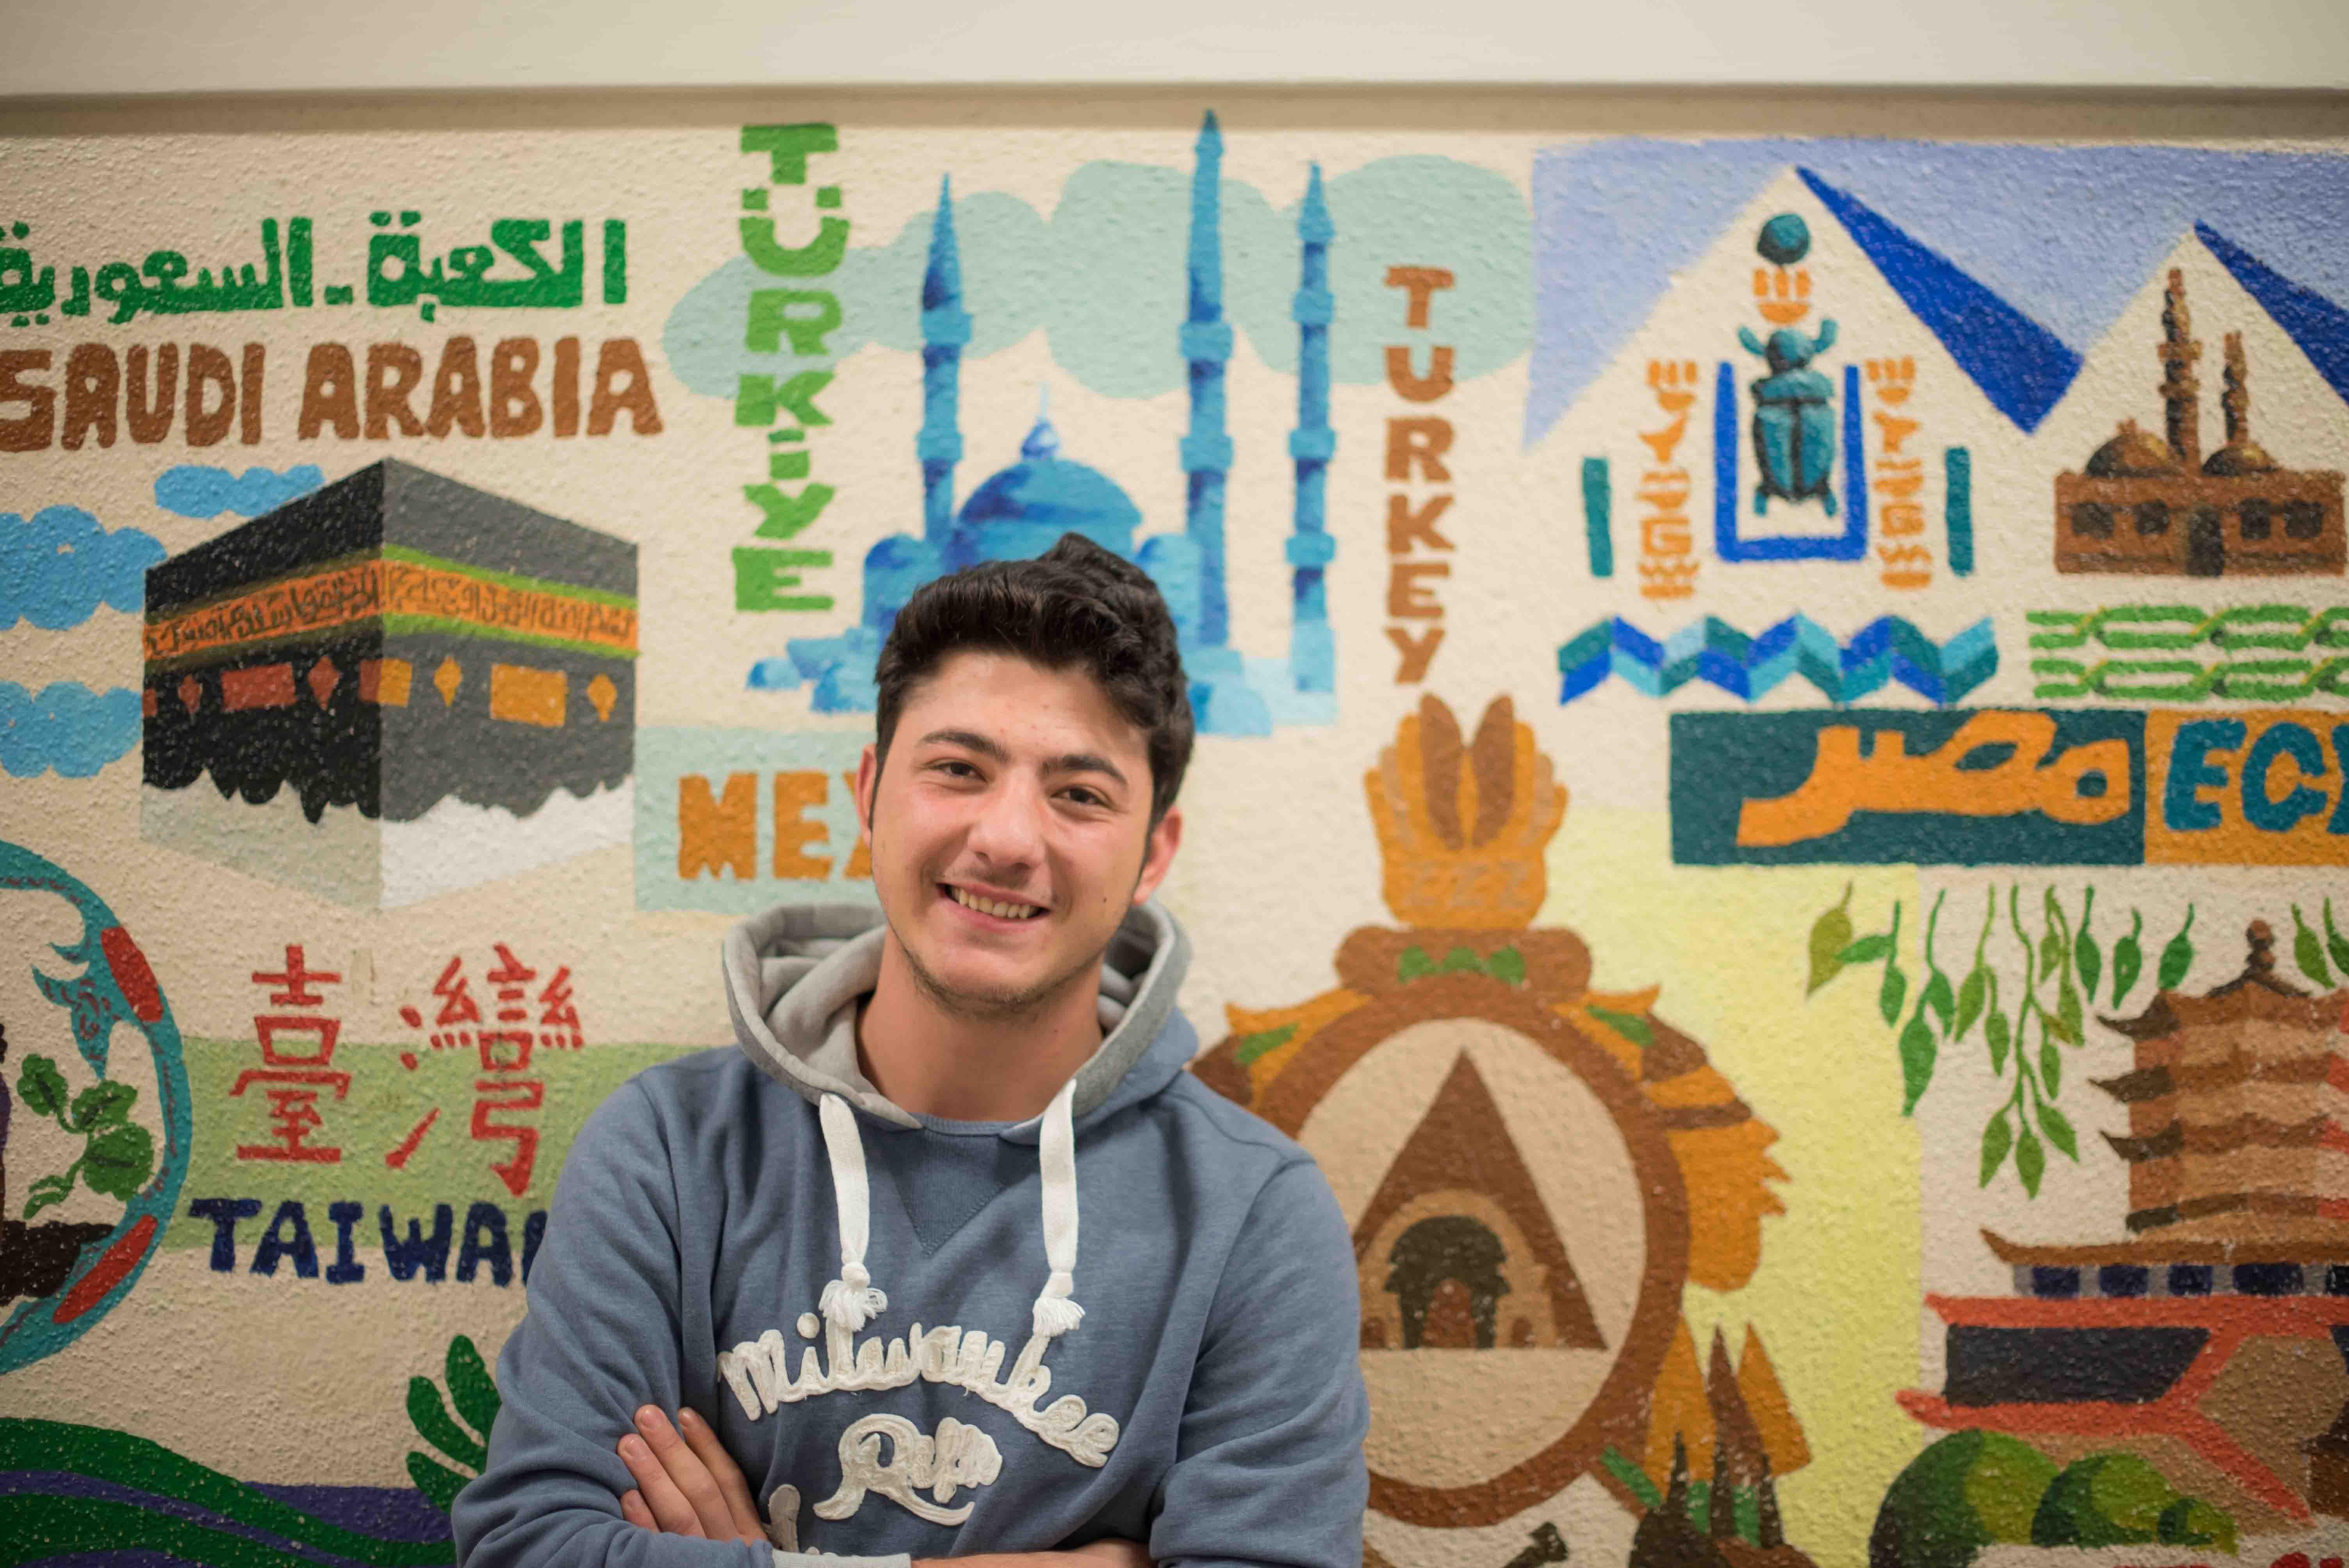 Nazmi from Turkey